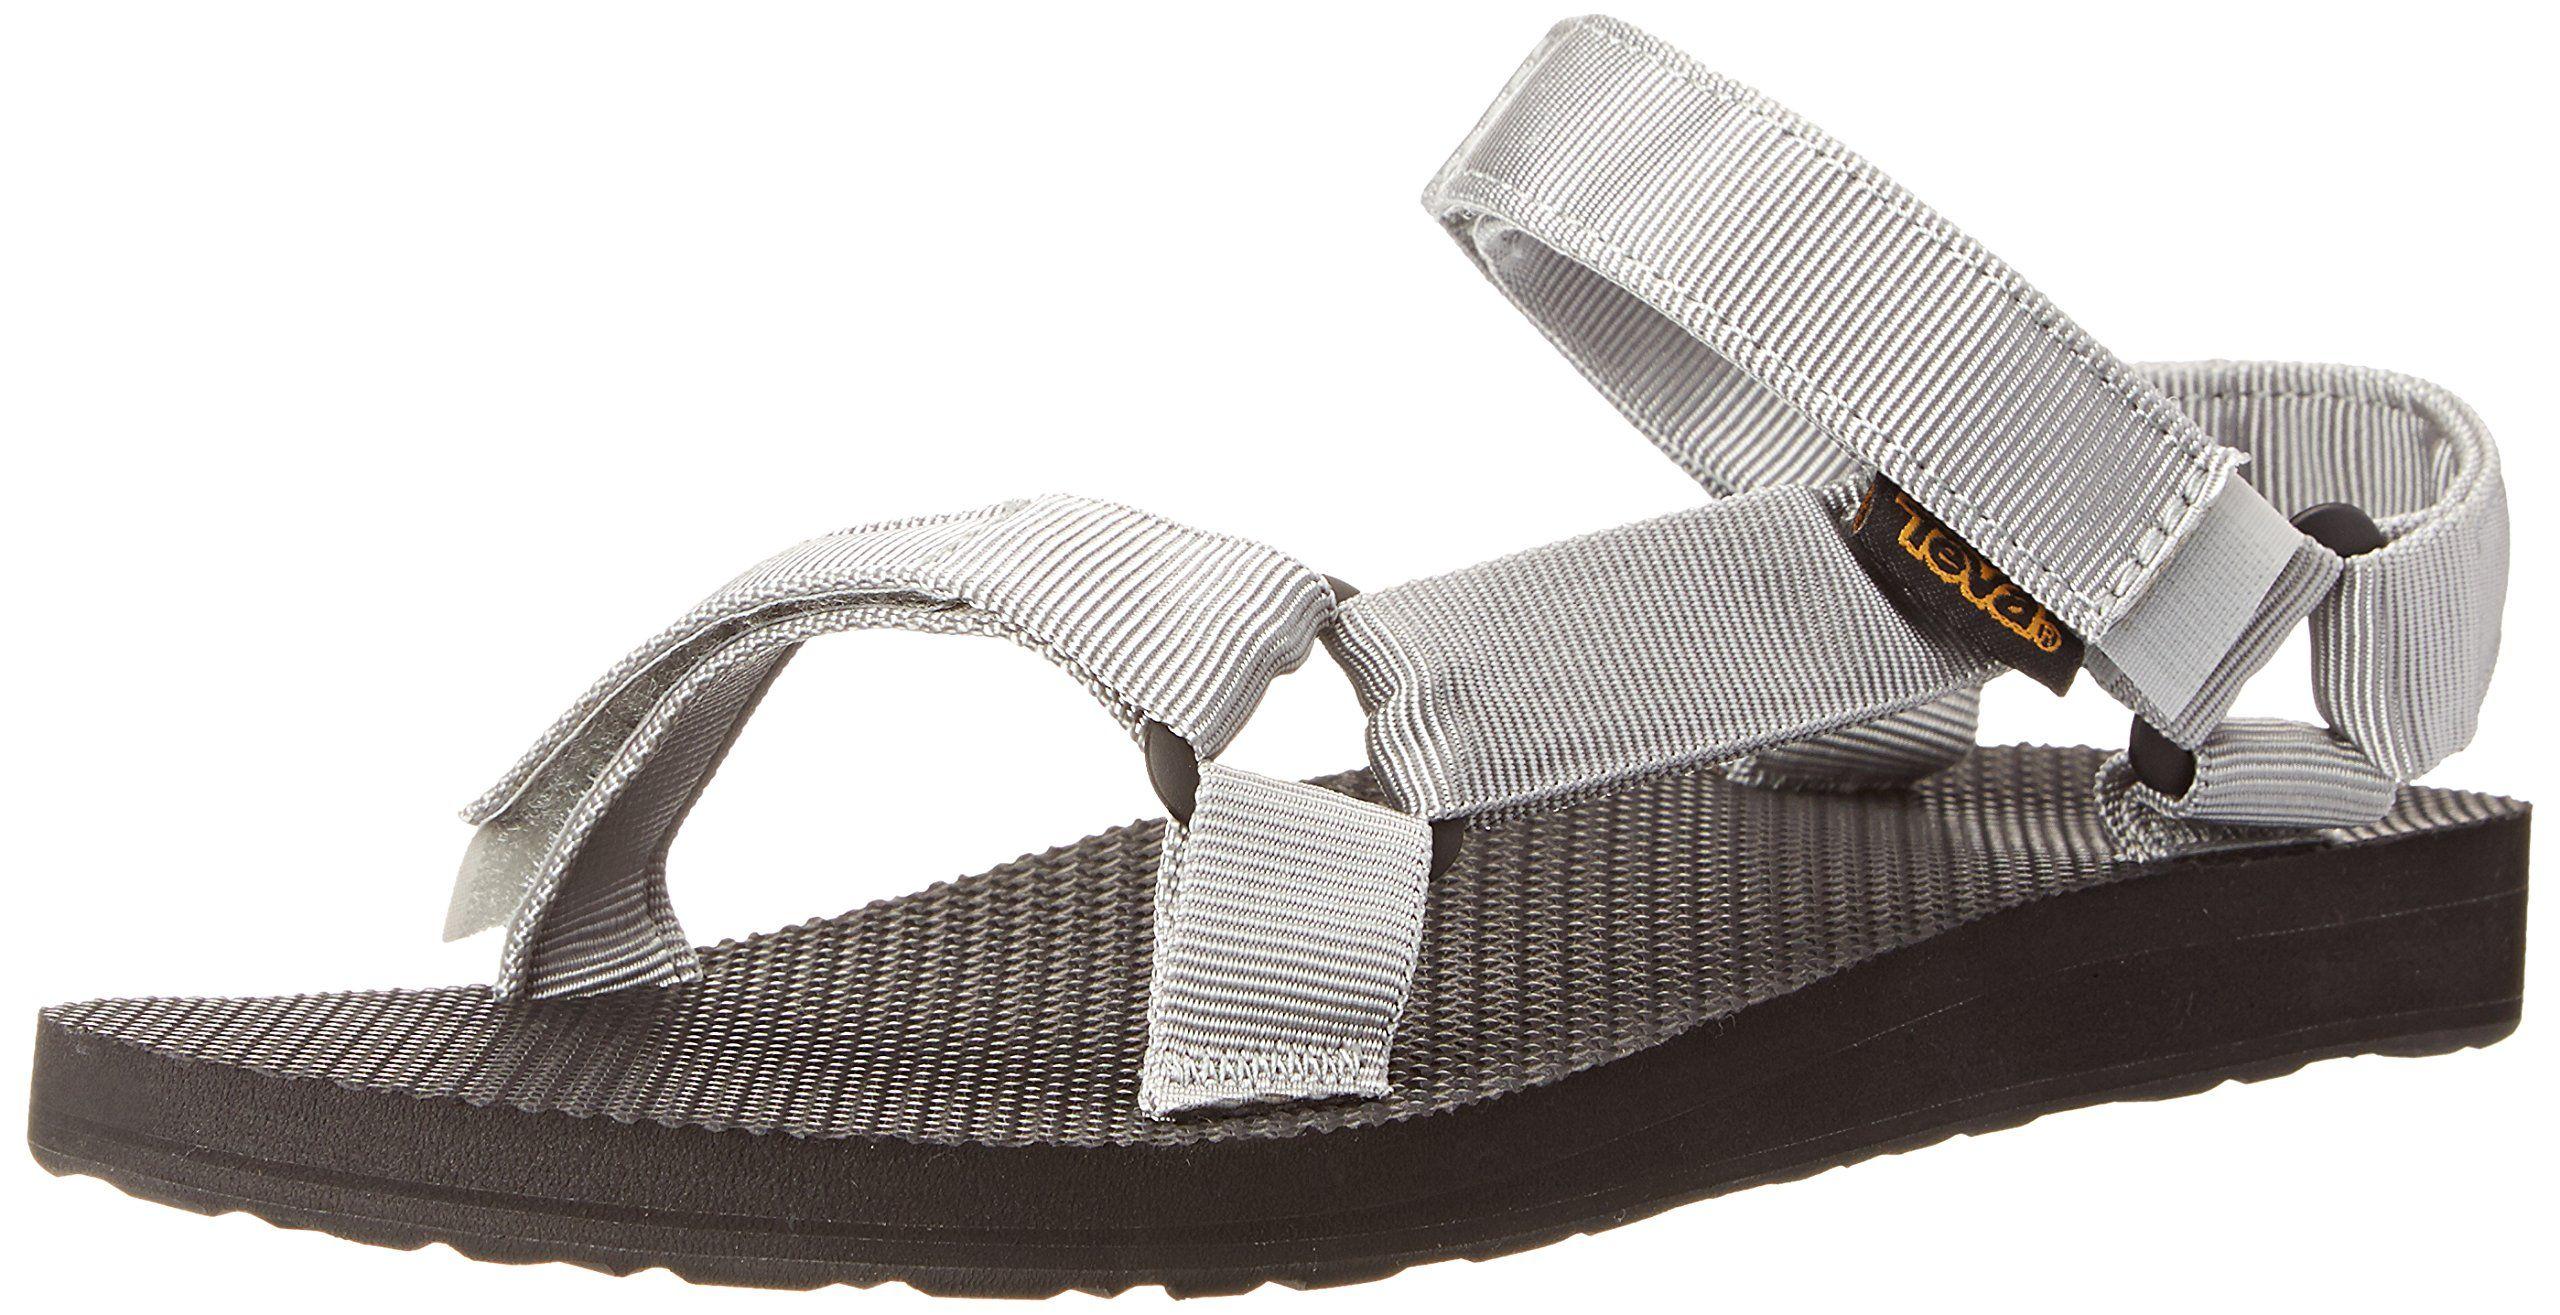 a26181876d49d4 Teva Women s Original Universal Sandal